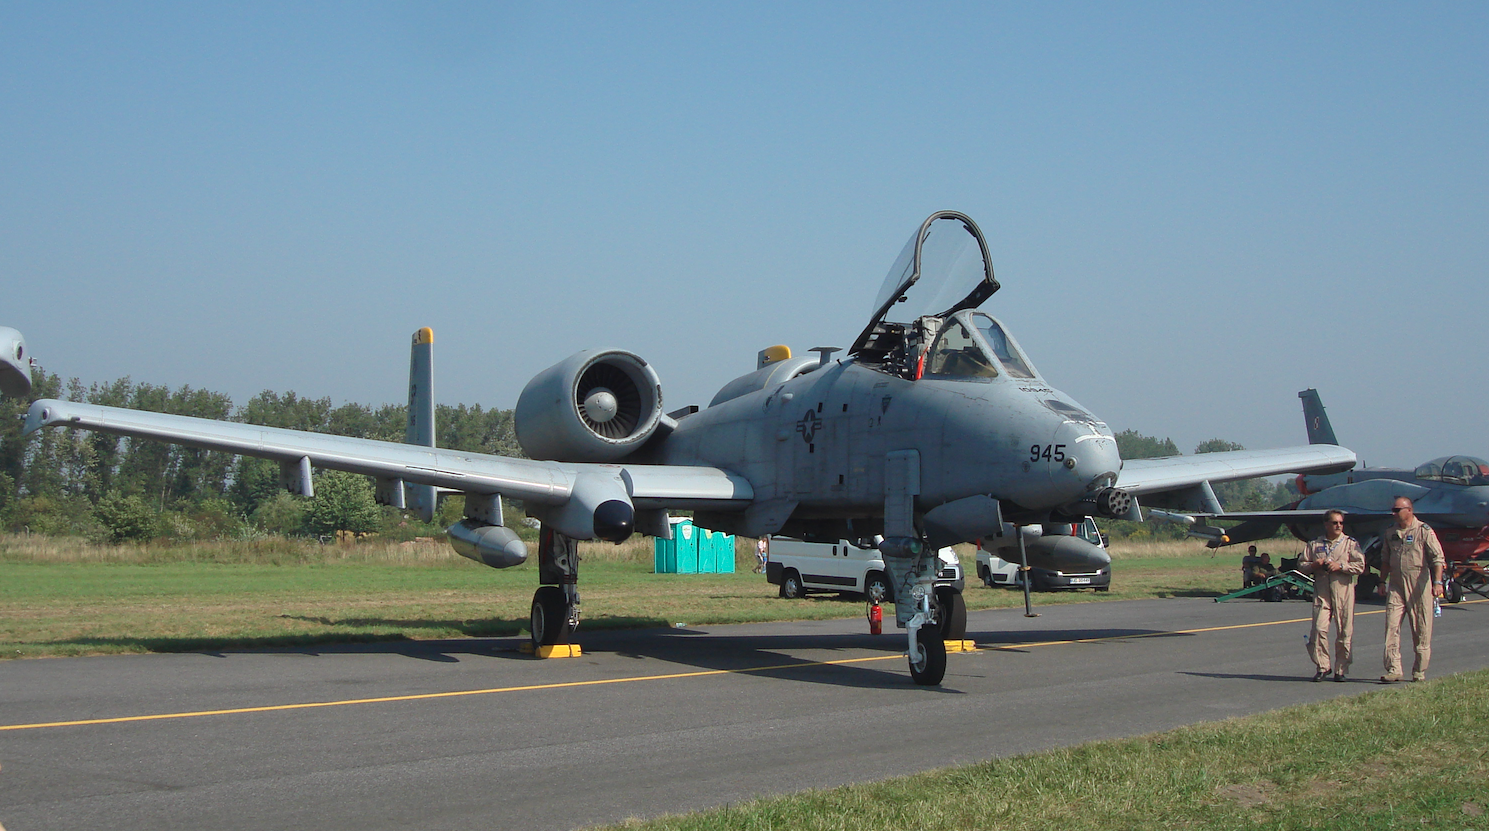 Fairchild A-10 nb 945. 2011 rok. Zdjęcie Karol Placha Hetman